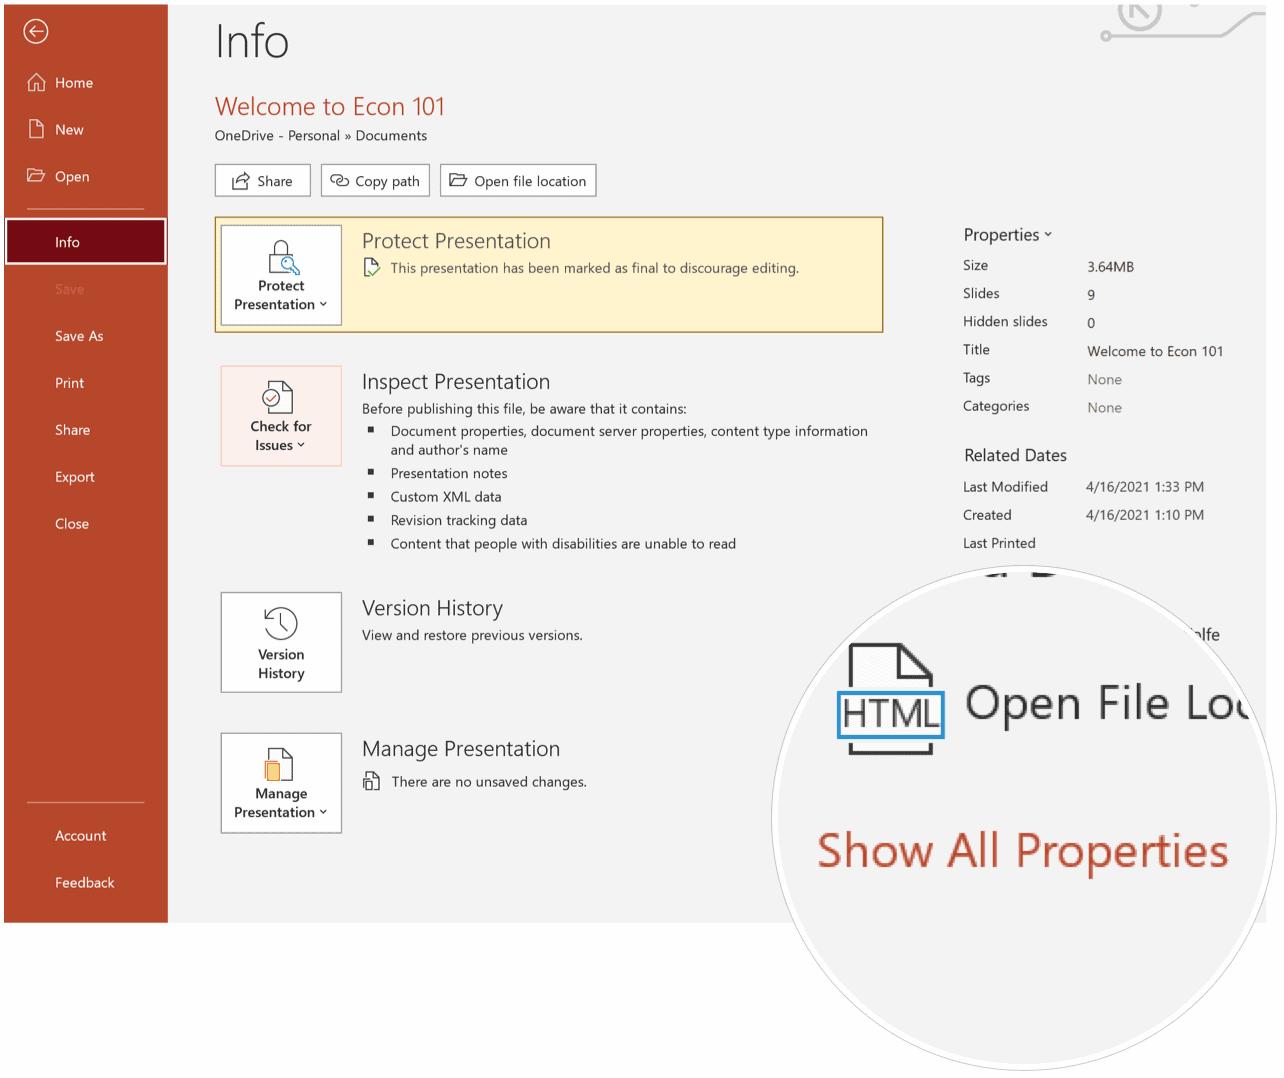 PowerPoint Presentation Word Count on Windows